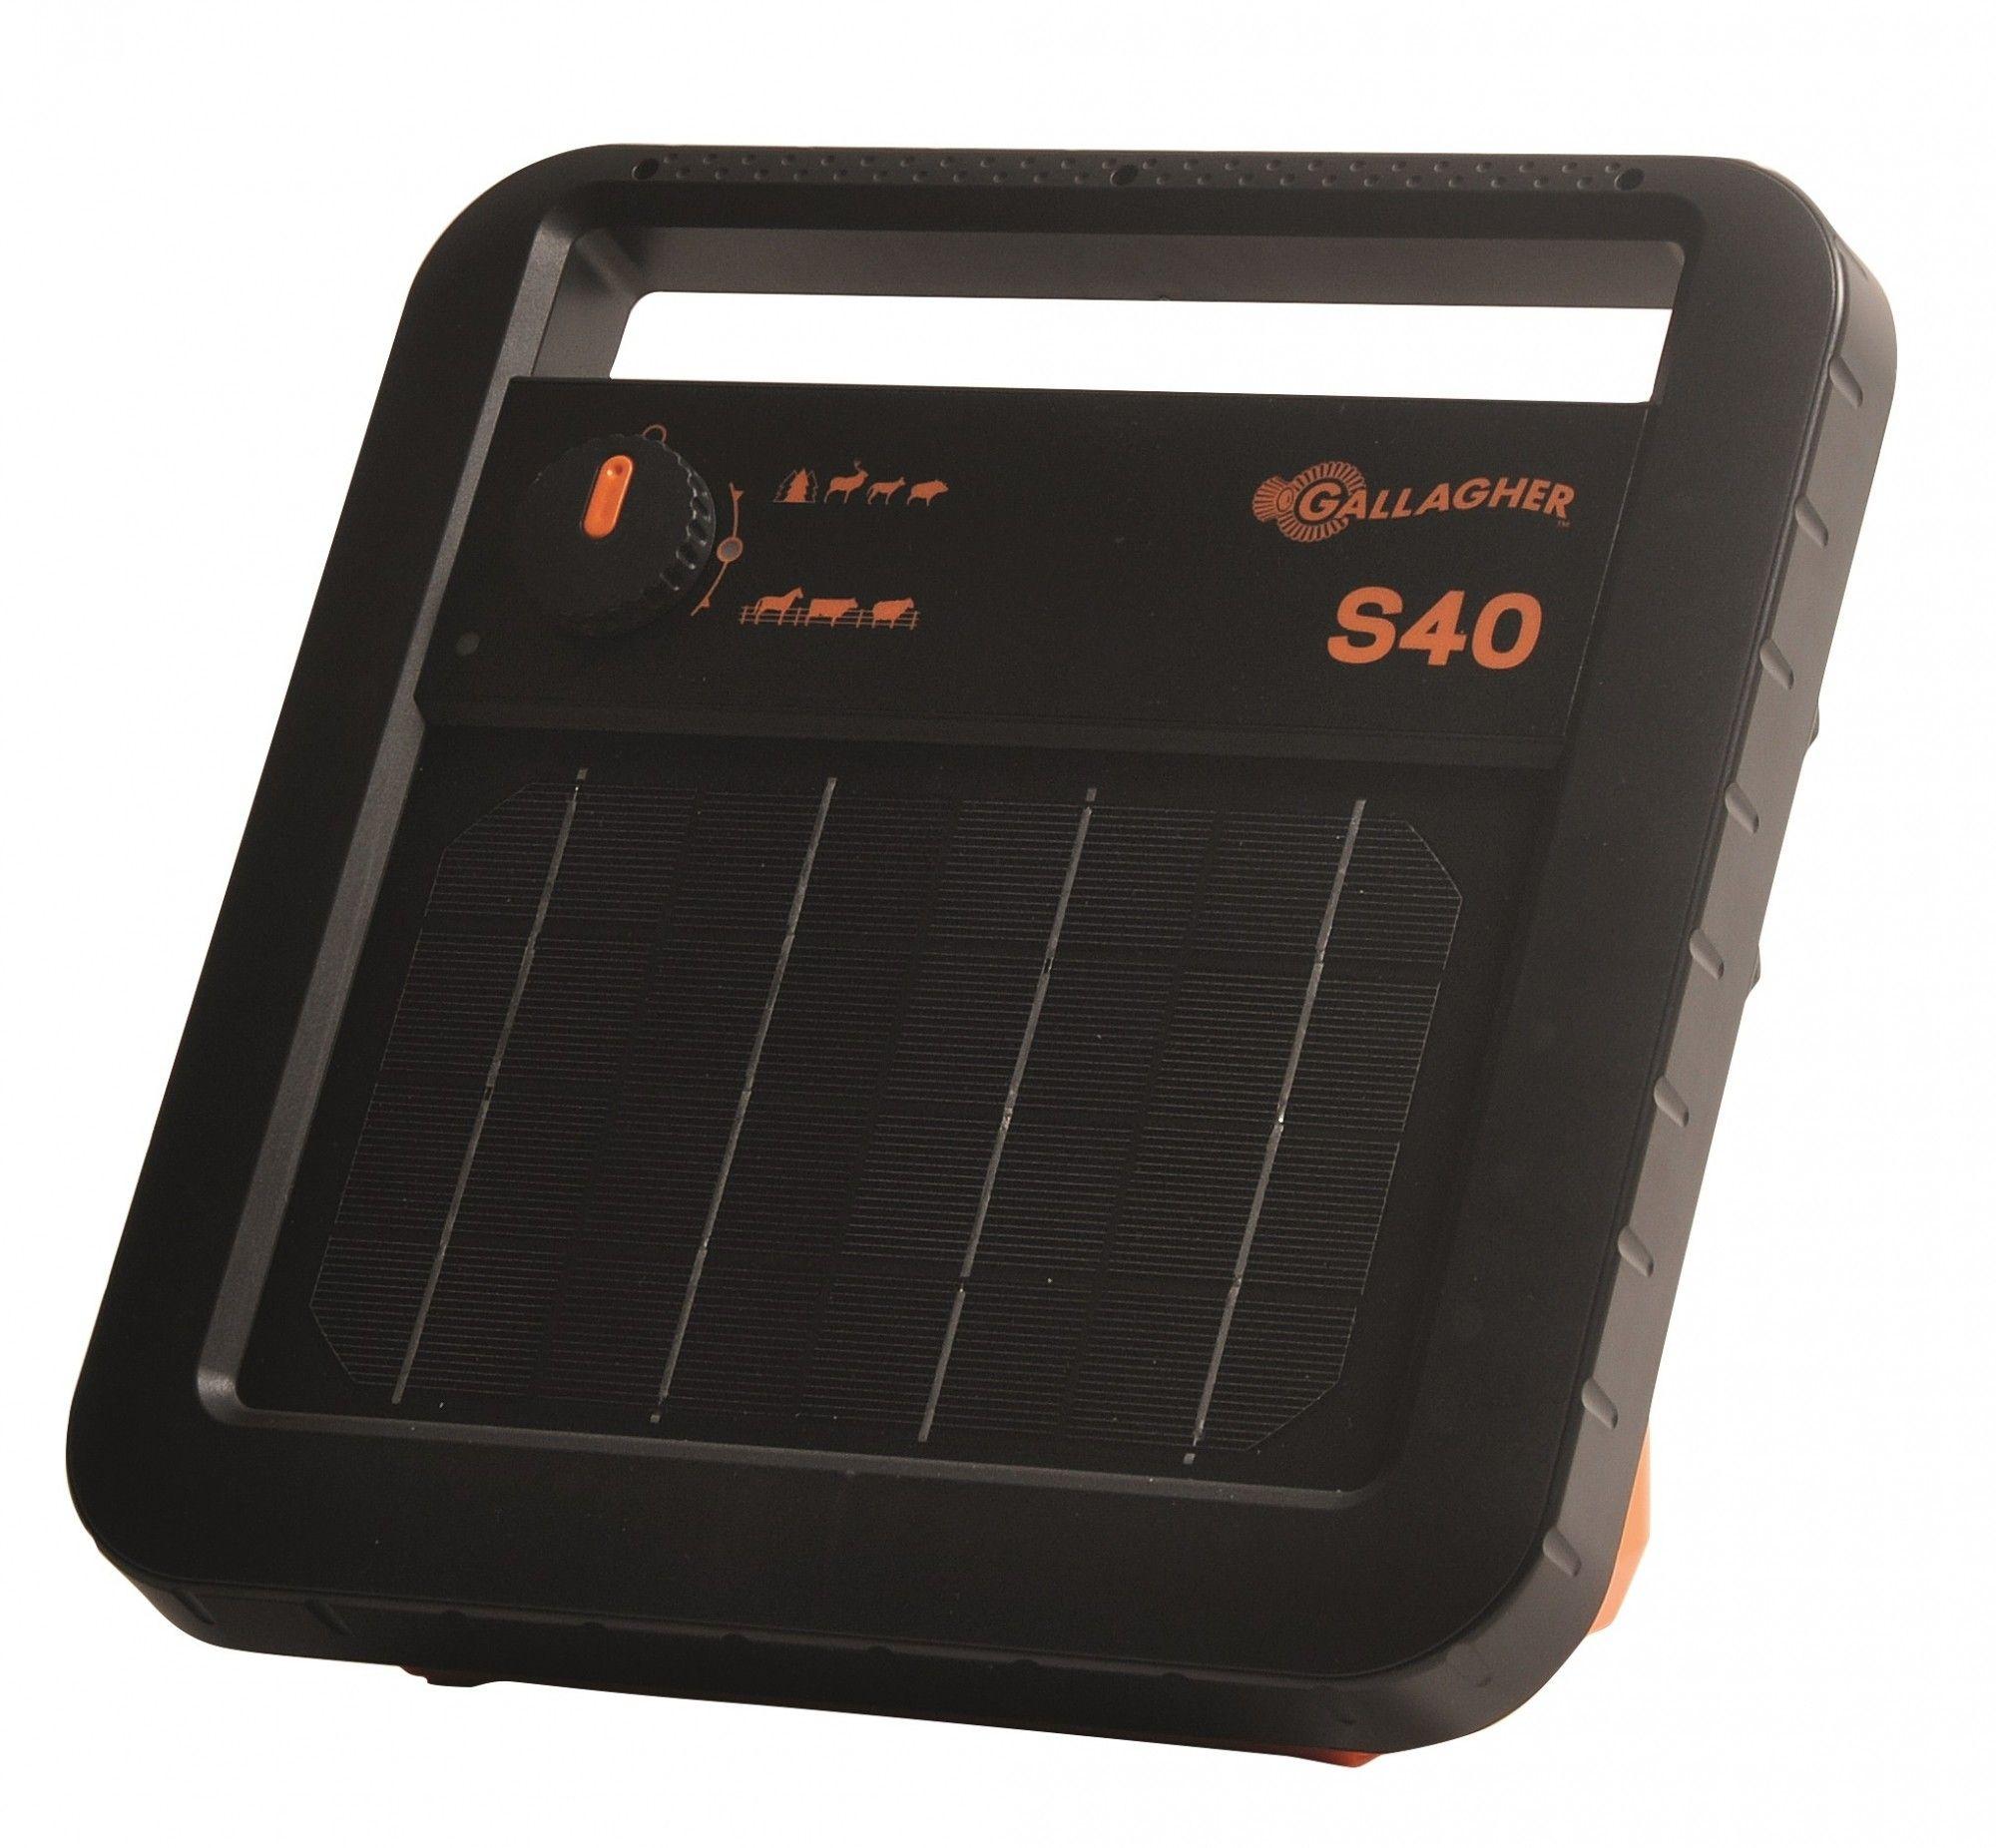 Schrikdraadapparaat Gallagher S40 solar (zonne-energie) inclusief accu.